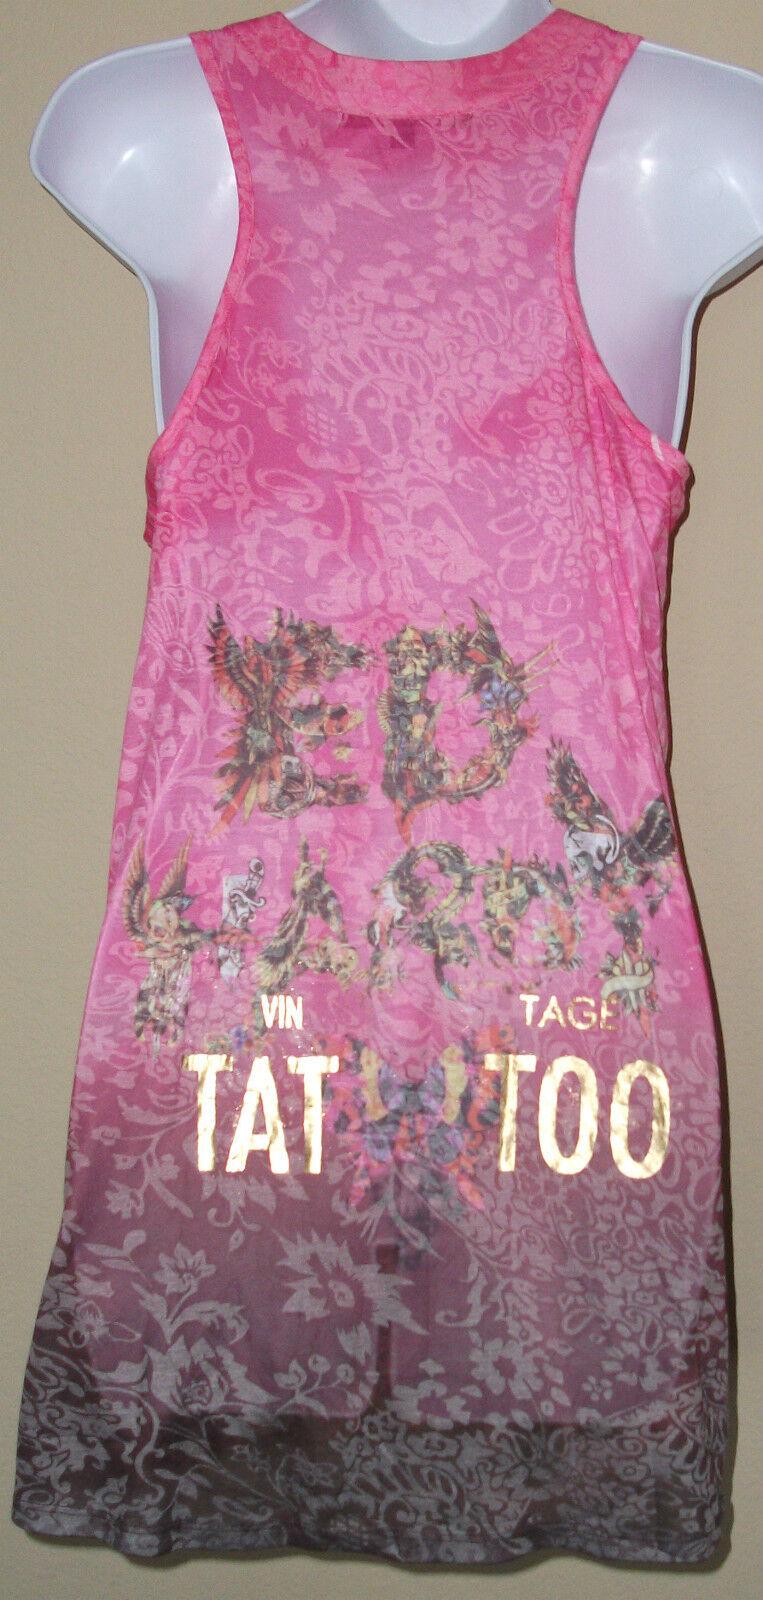 NWT Genuine ED HARDY by CHRISTIAN AUDIGIER sleeveless sleeveless sleeveless pink mini dress,size S 28422a